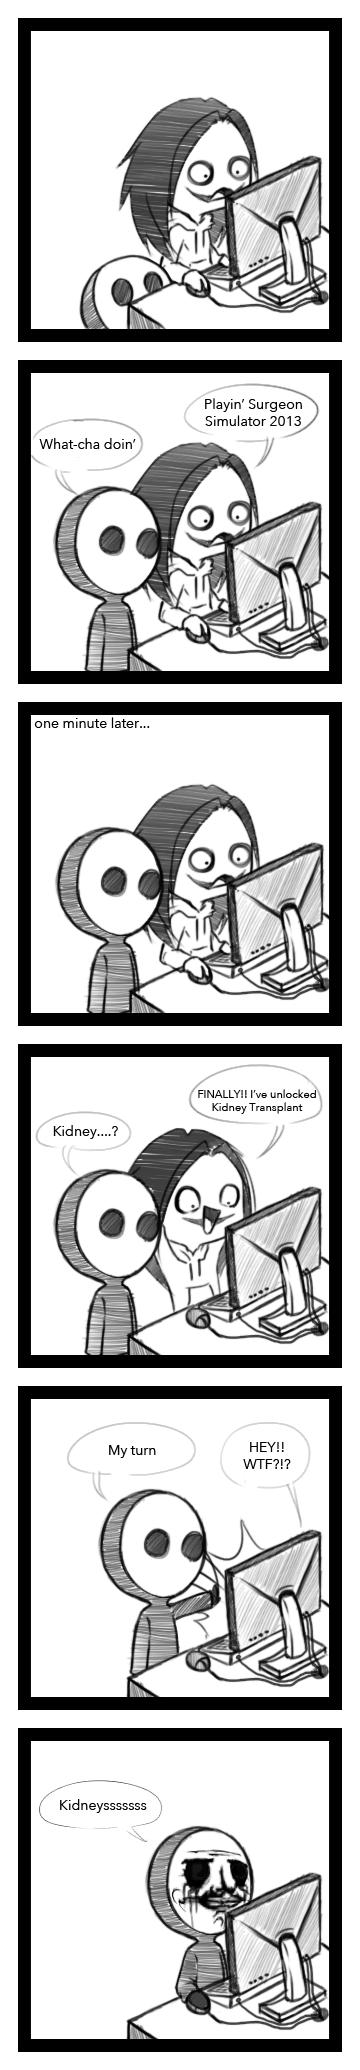 Surgeon Simulator 2013 Mini Comic  by SUCHanARTIST13